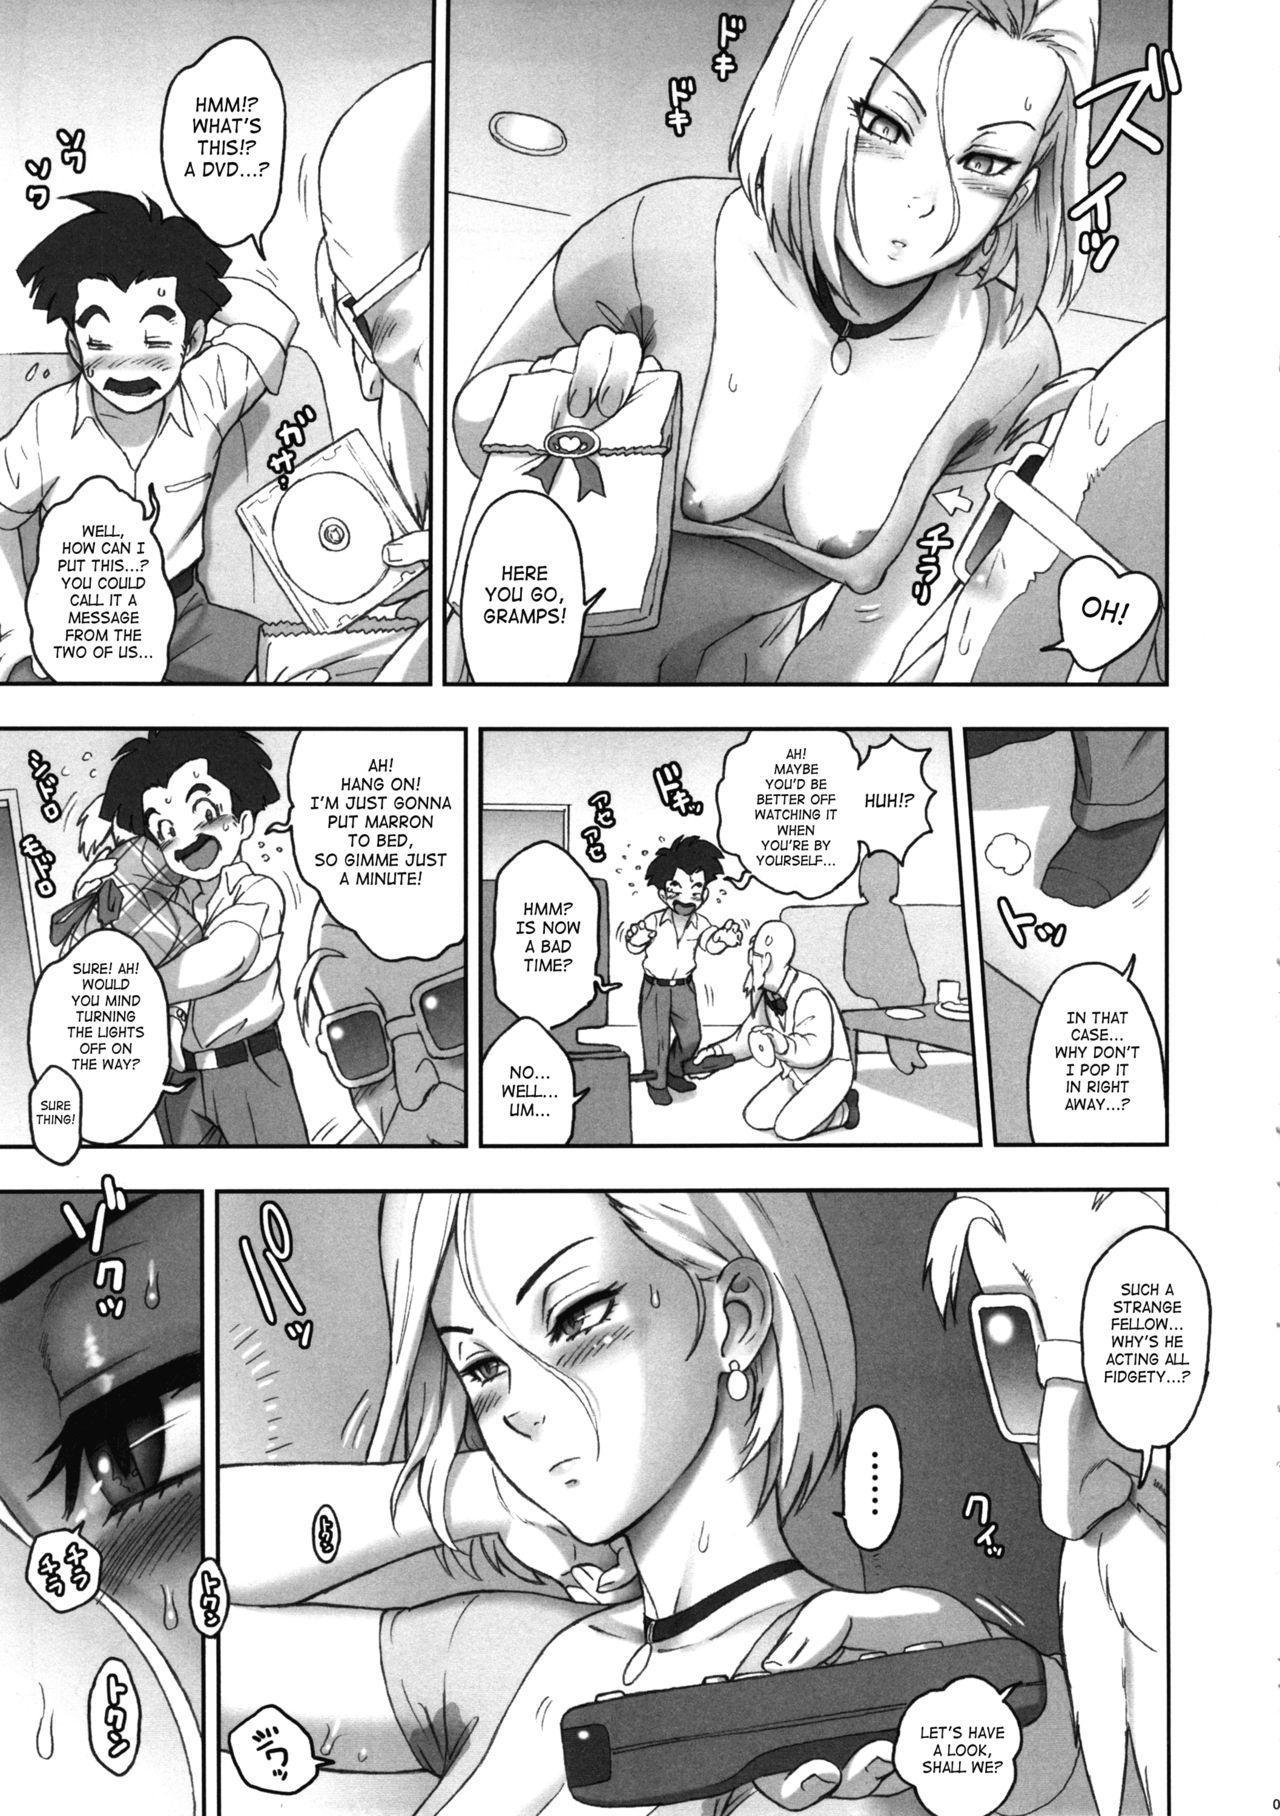 (C87) [Niku Ringo (Kakugari Kyoudai)] NIPPON HEAD-CHA-LA (Dragon Ball Z) [English] [SaHa] [Decensored] 5